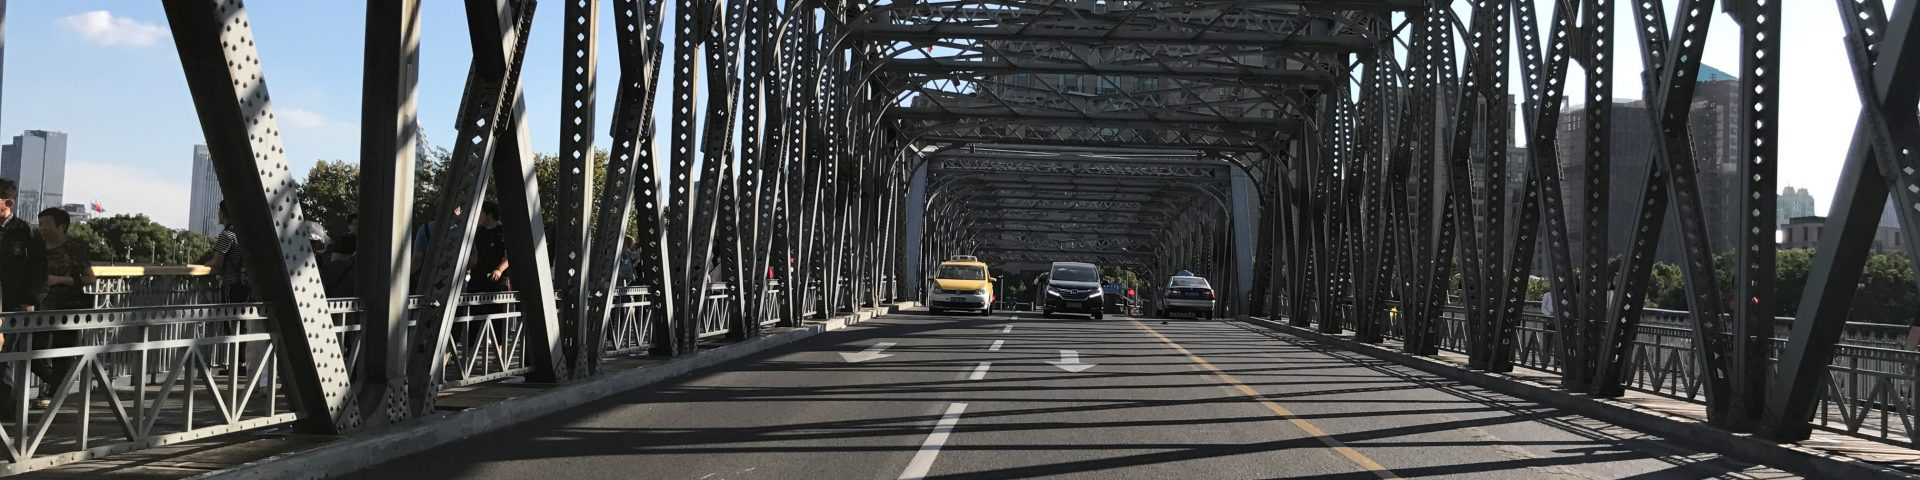 Waibaidu Bridge (外白渡桥)